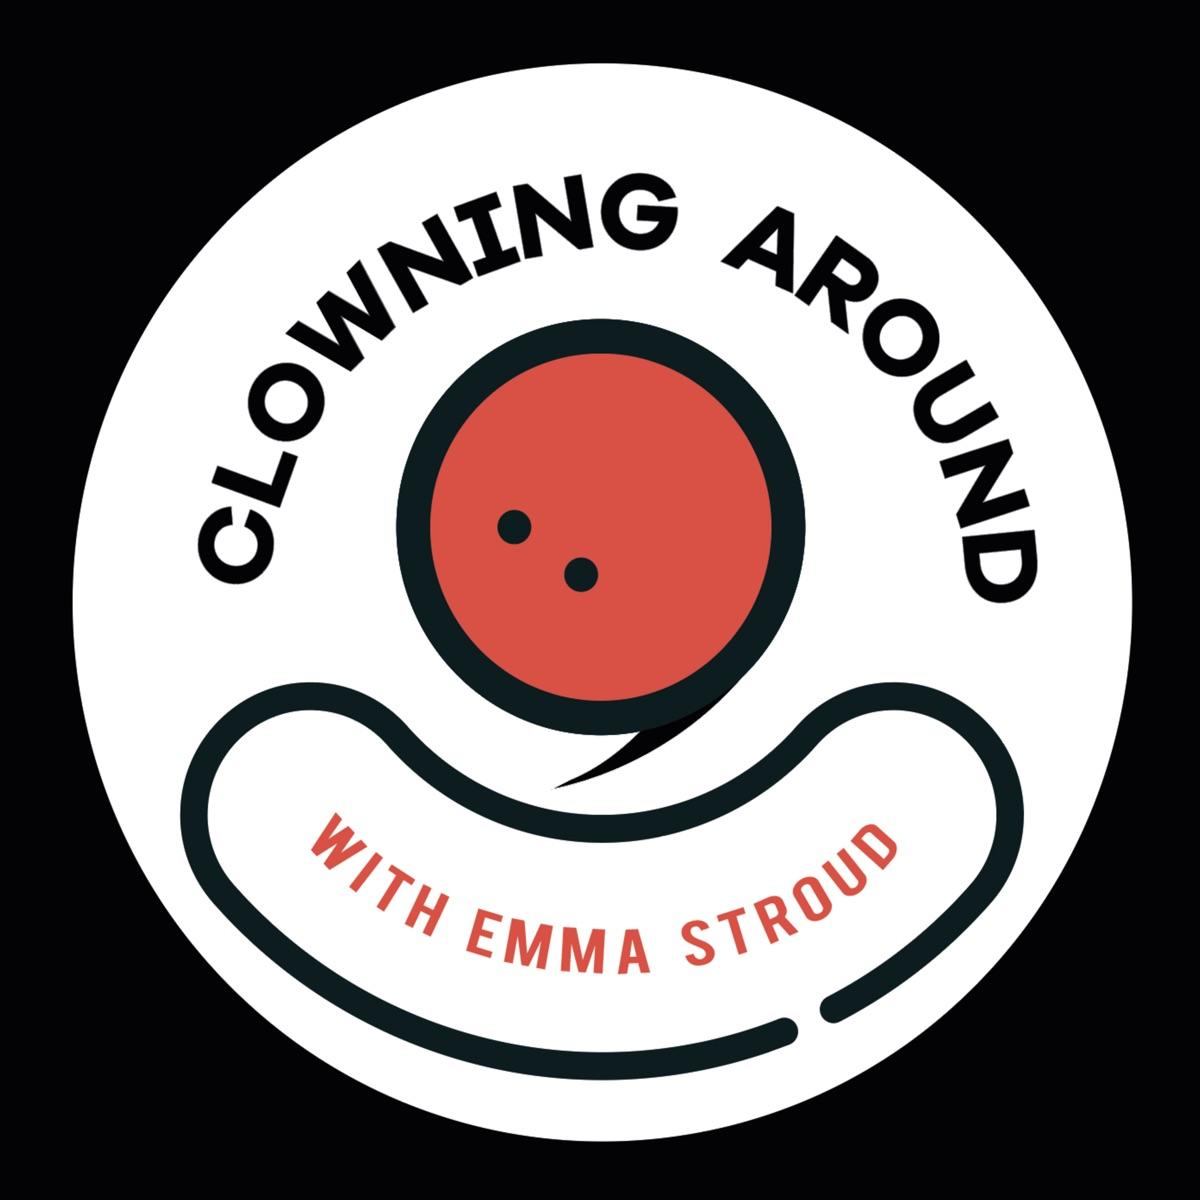 Clowning Around Podcast